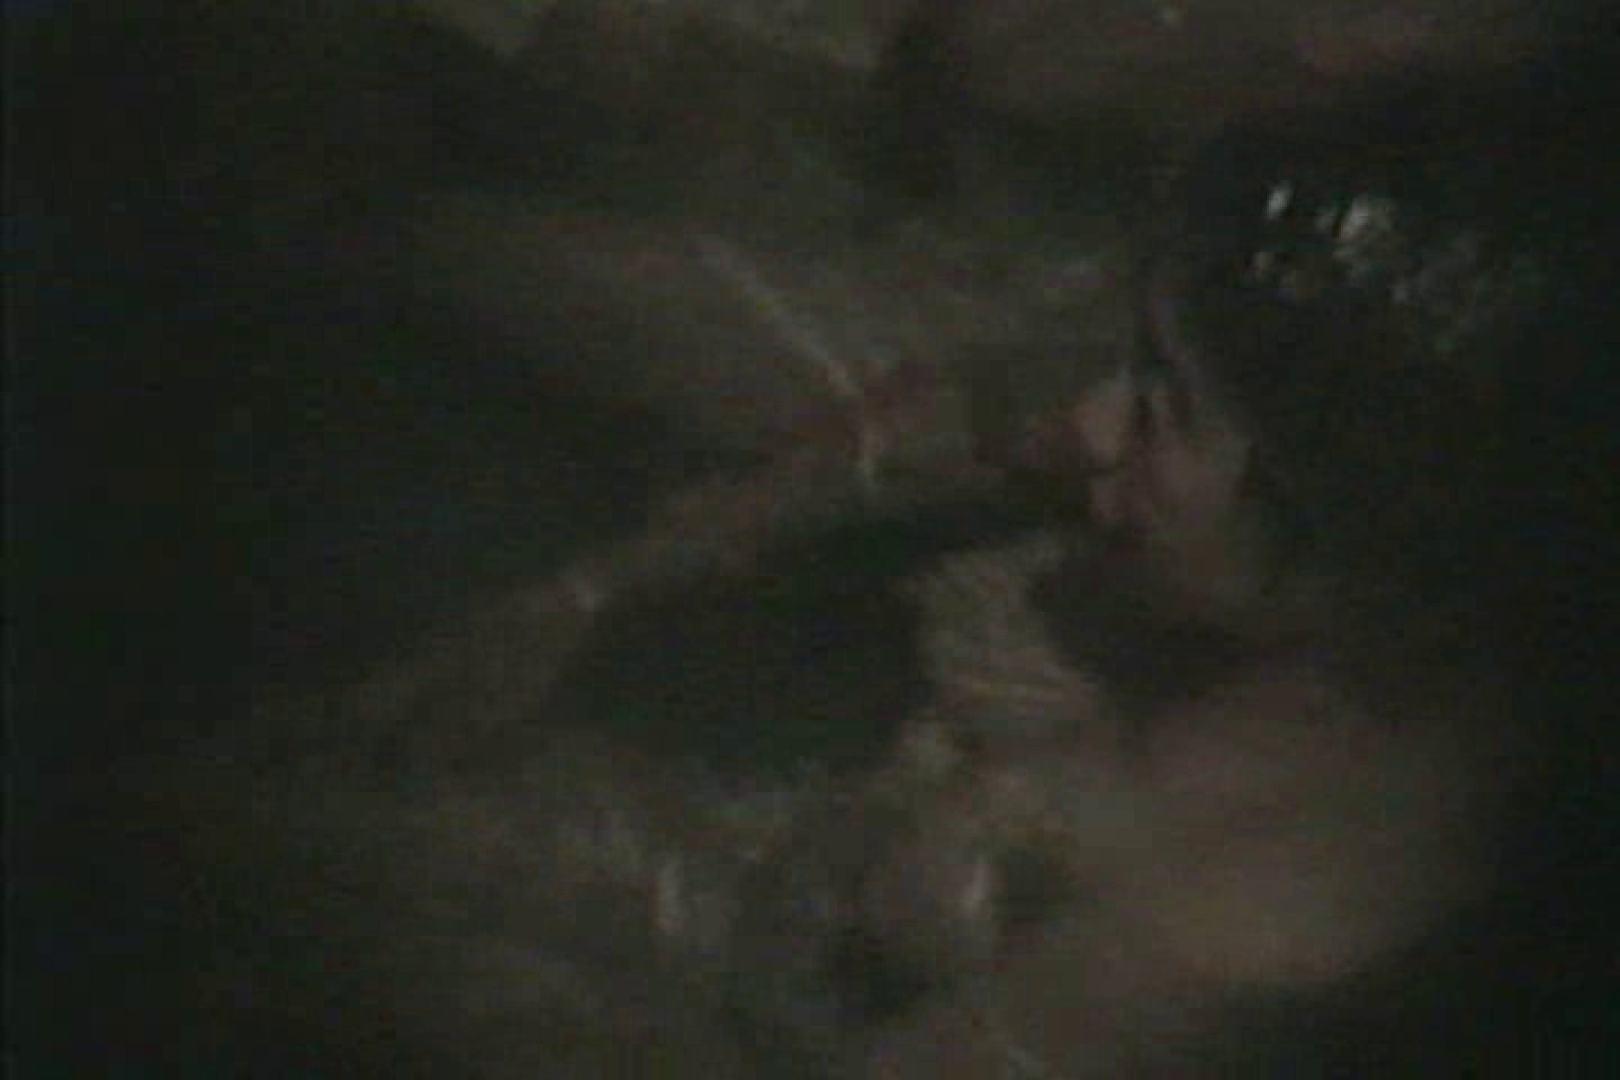 激撮!! 接写天井裏の刺客Vol.4 覗き  104PIX 24